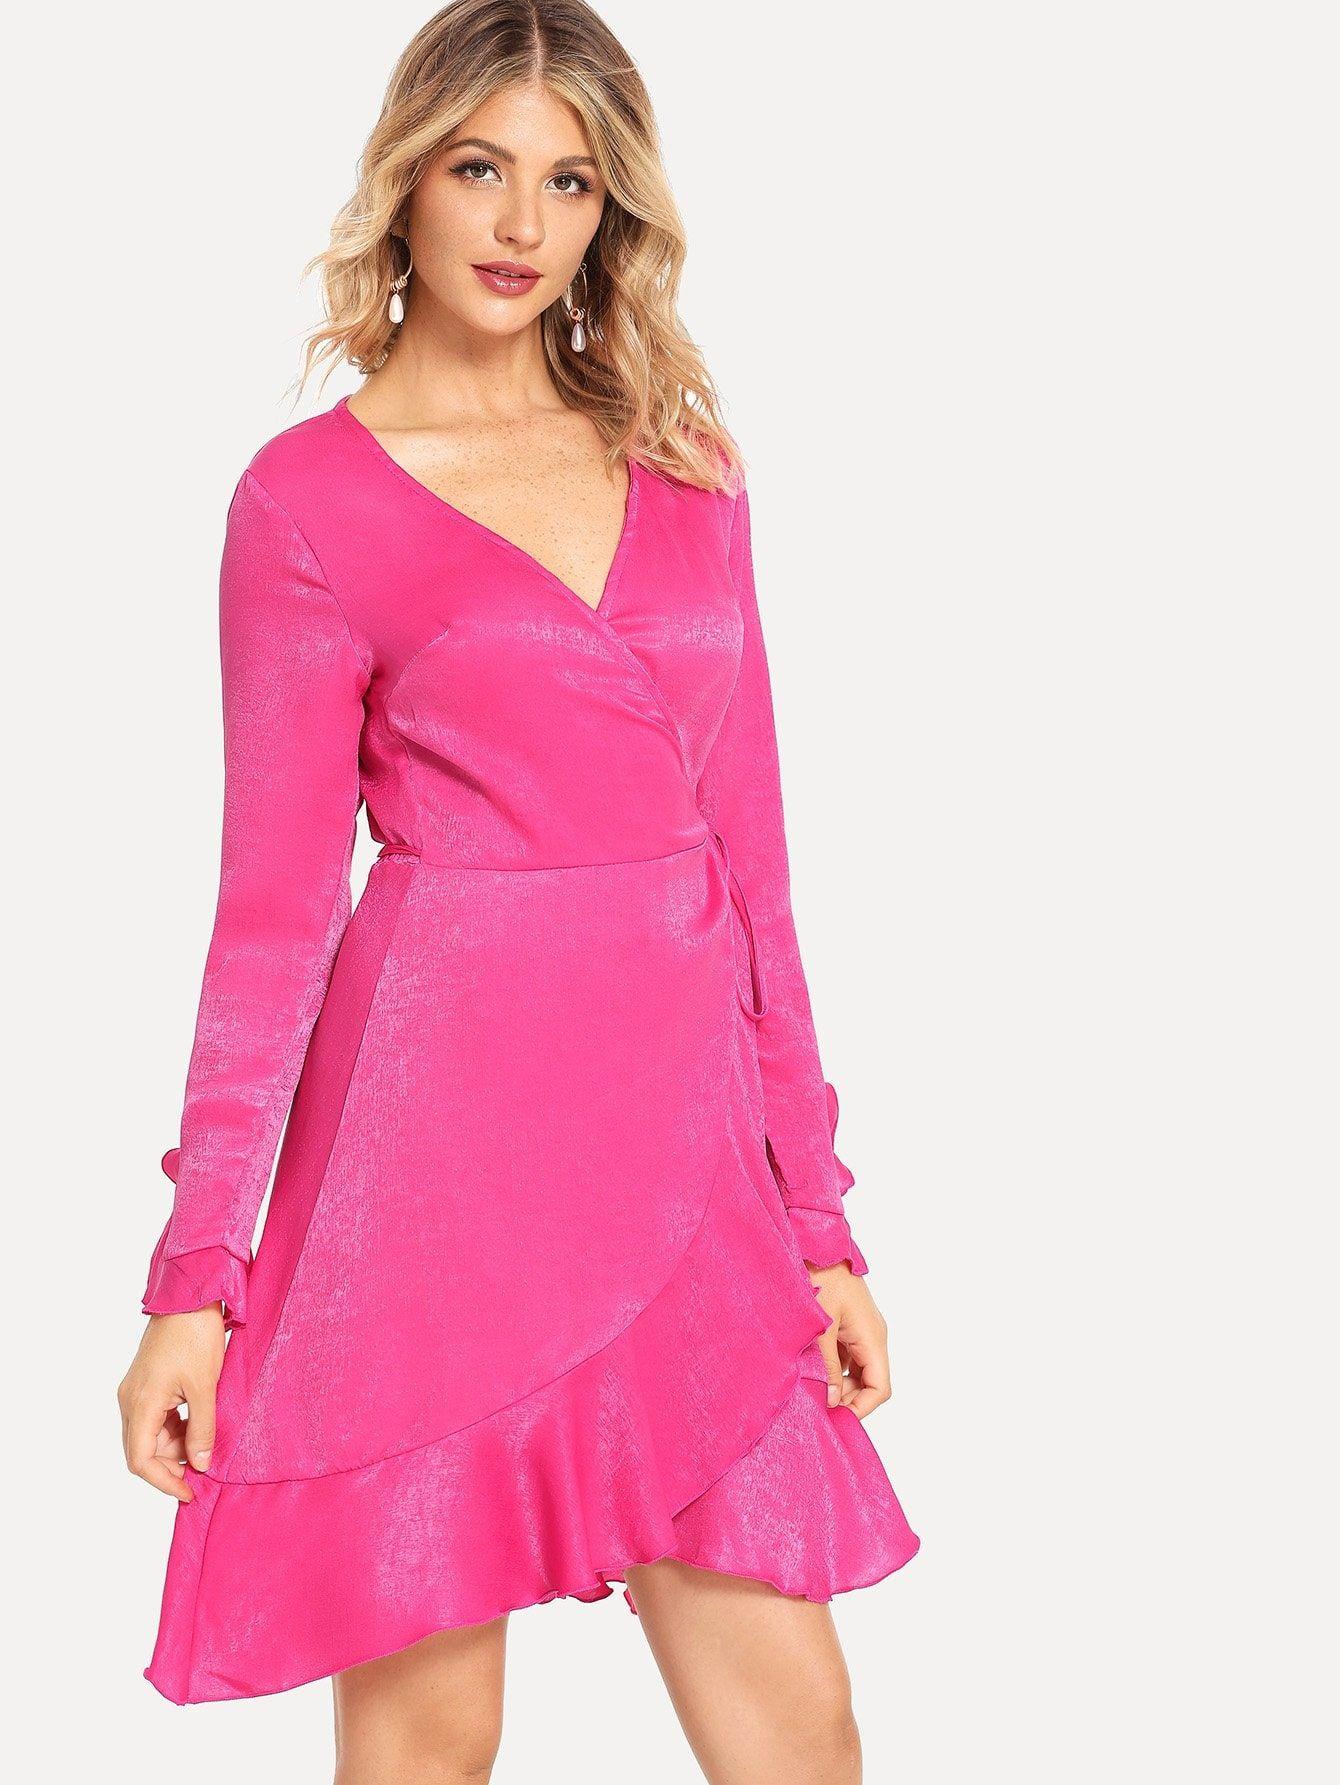 3c08ba993e Casual Wrap and Ruffle Hem and Knot Plain Fit and Flare V Neck Long Sleeve  Flounce Sleeve Natural Hot Pink Short Length Ruffle Hem Wrap Bell Sleeve  Dress